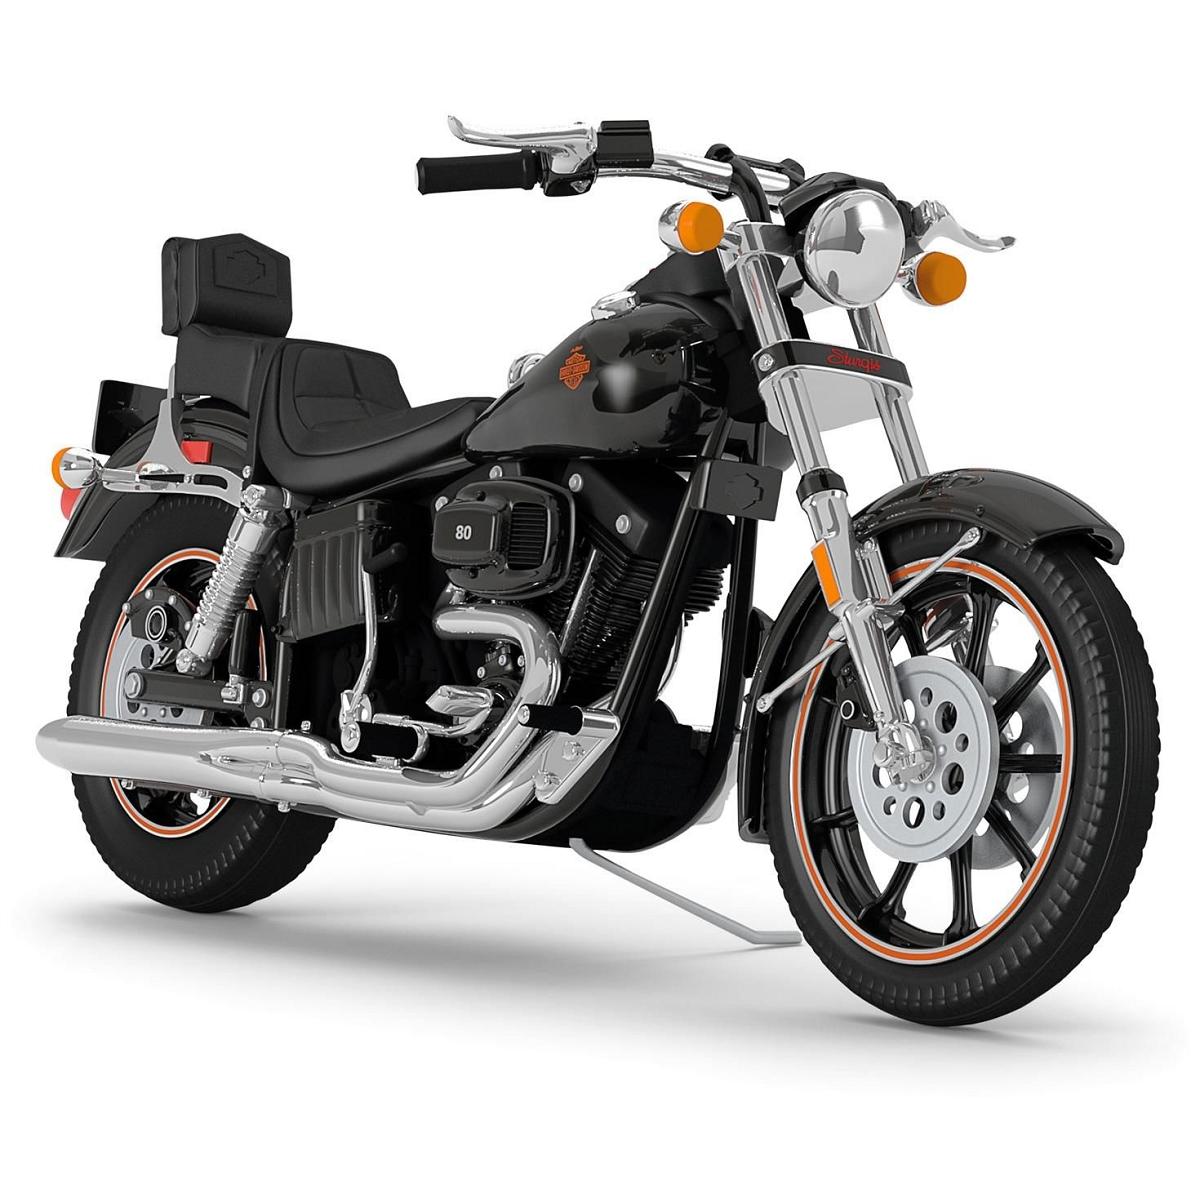 2016 1980 FBX Sturgis Harley Davidson Motorcycle Hallmark ...